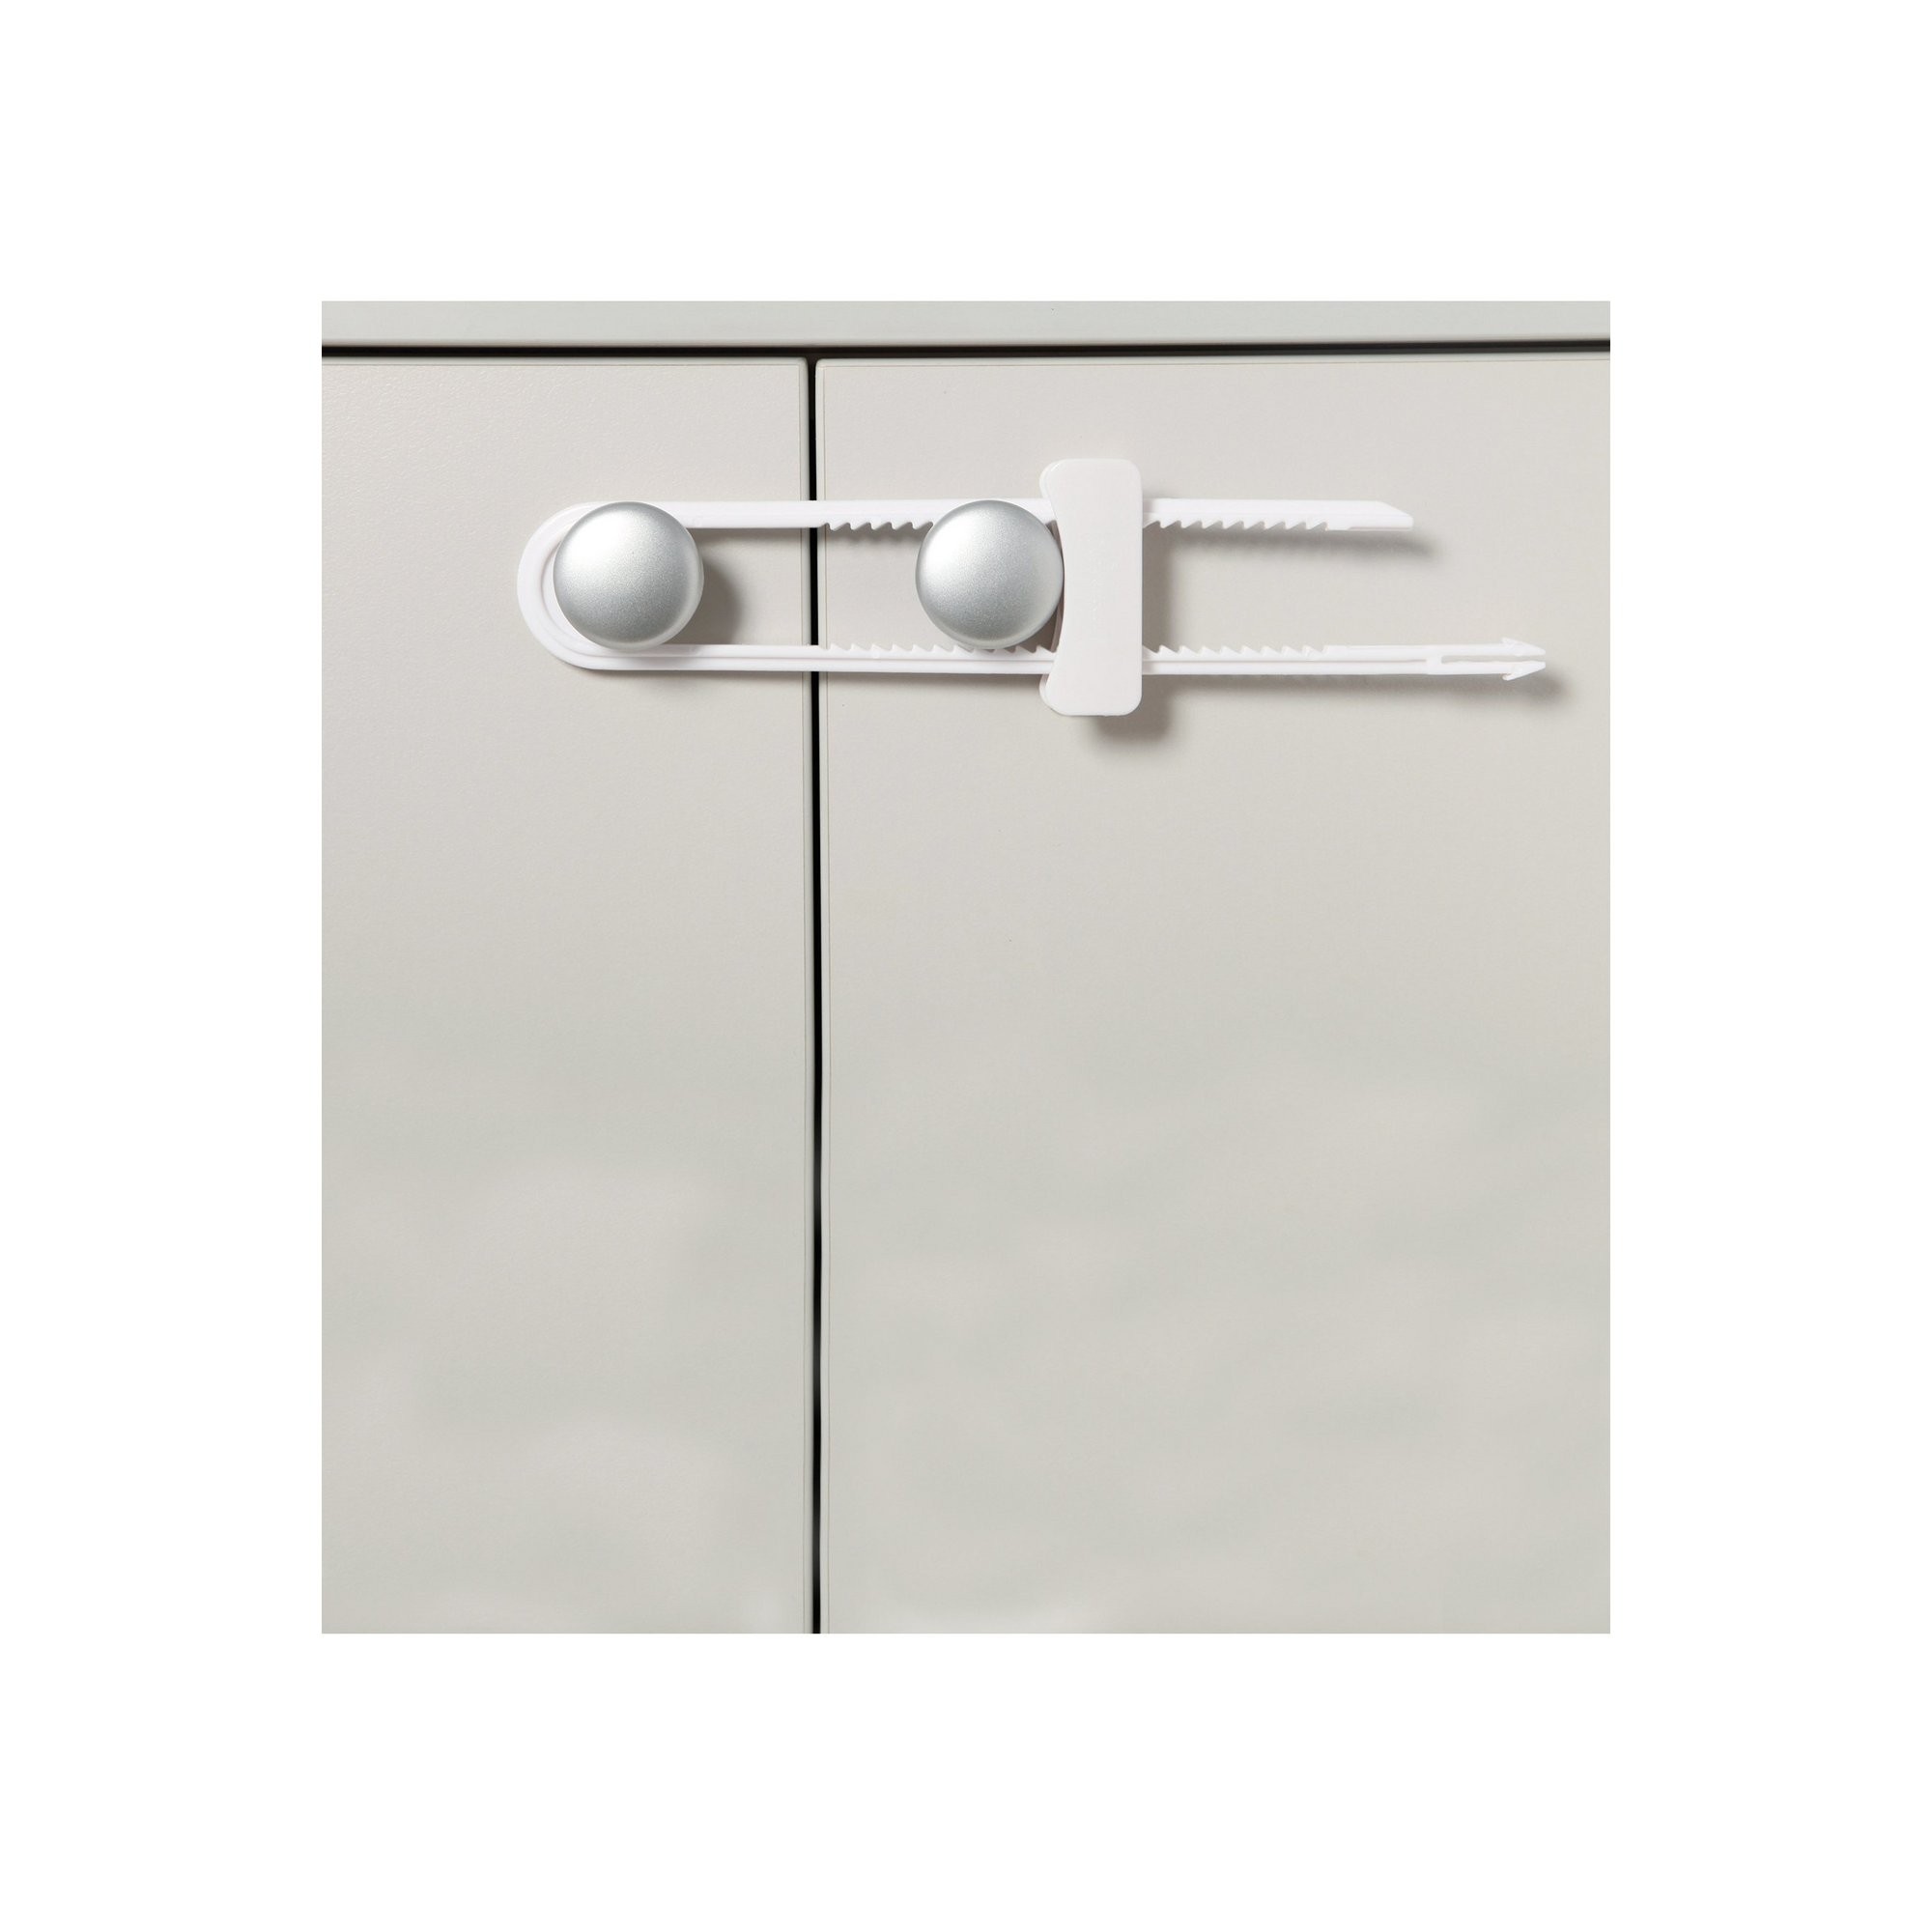 Image of 3 Sliding Cabinet Locks